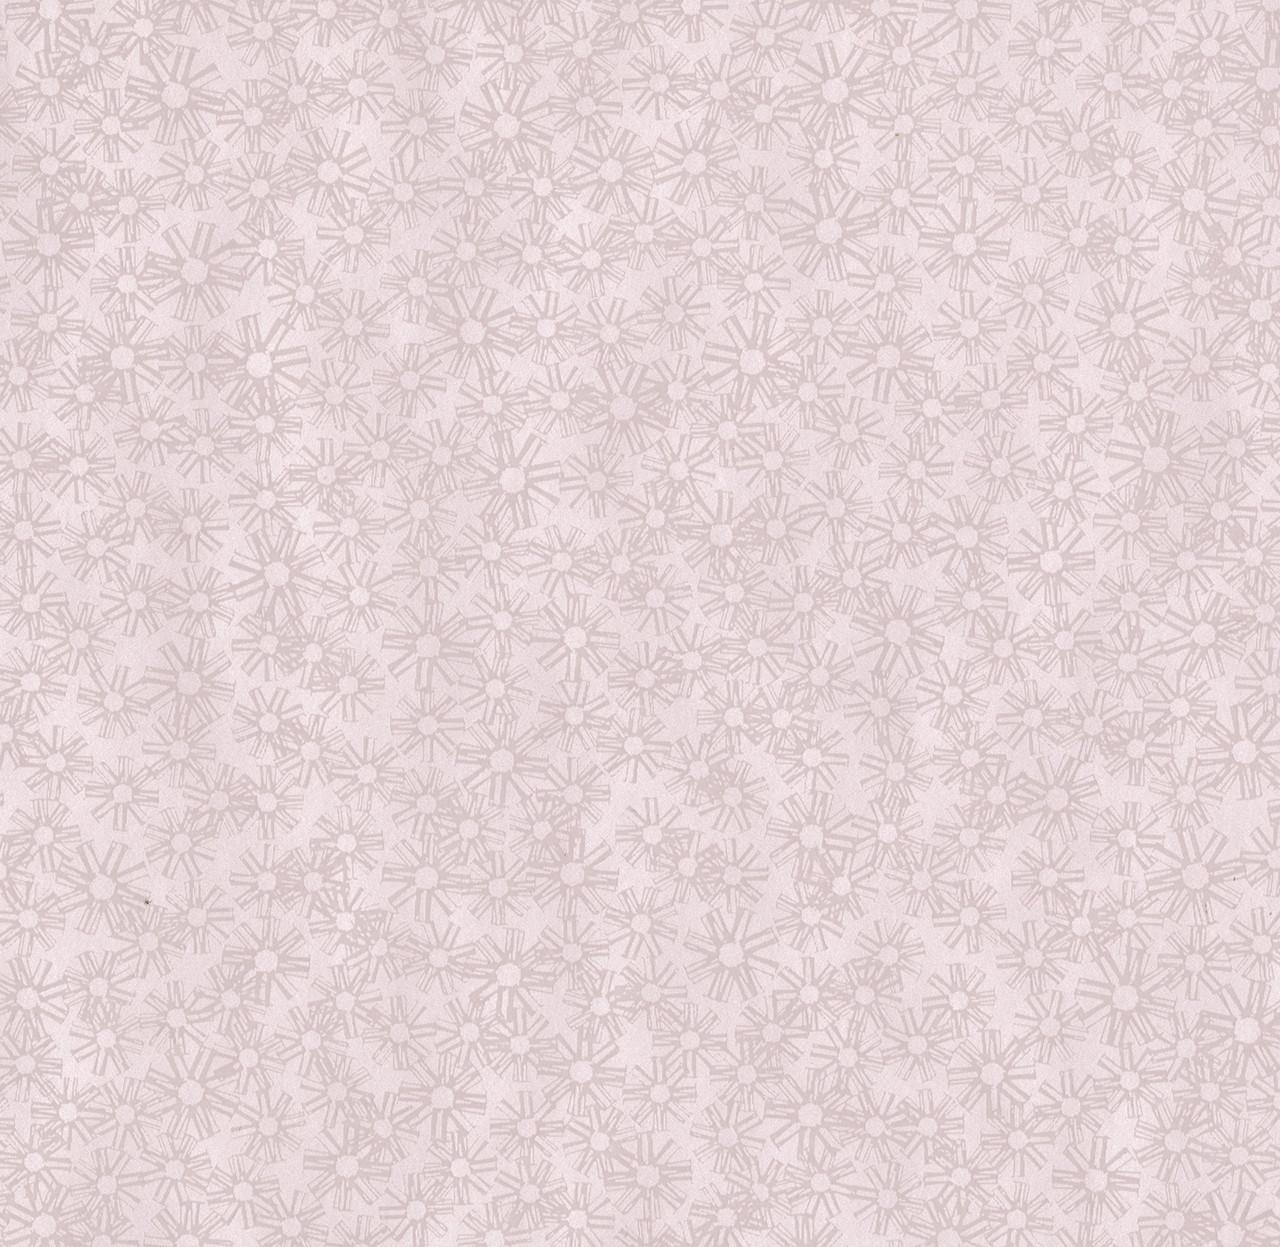 Janie Pink Metallic Floral 352060 Wallpaper Indoorwallpaper Com